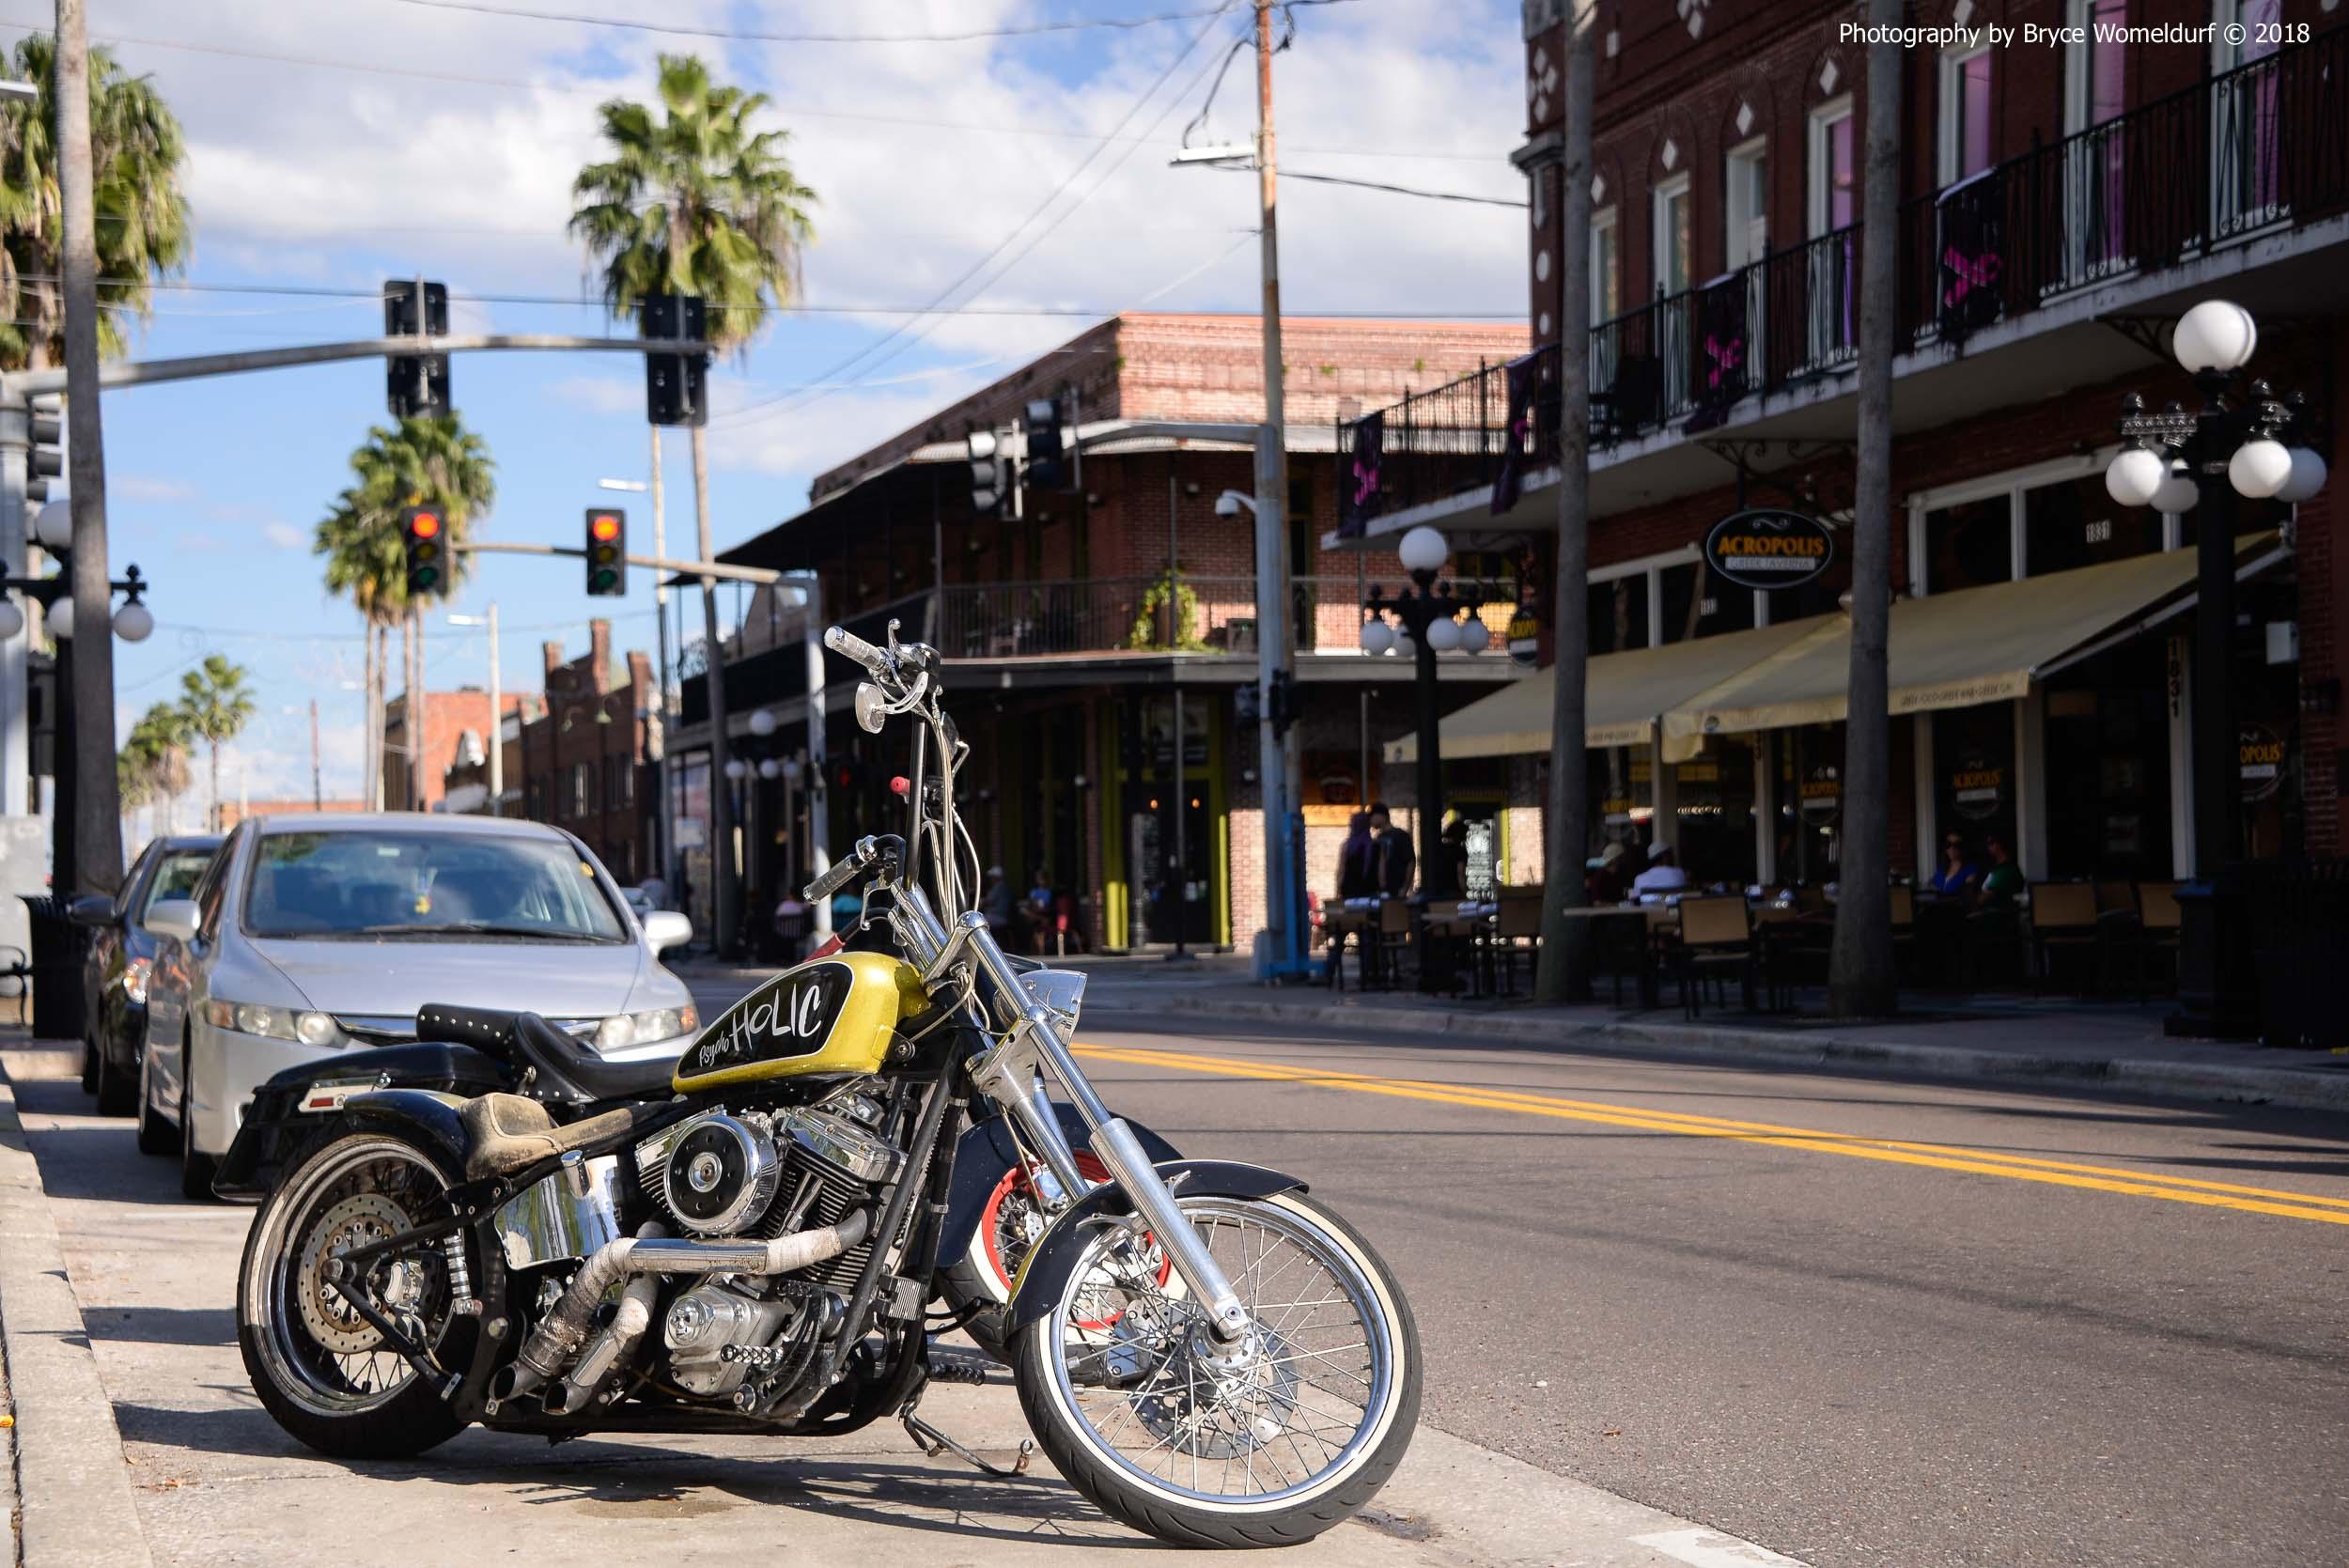 City Street | Ybor City, Florida